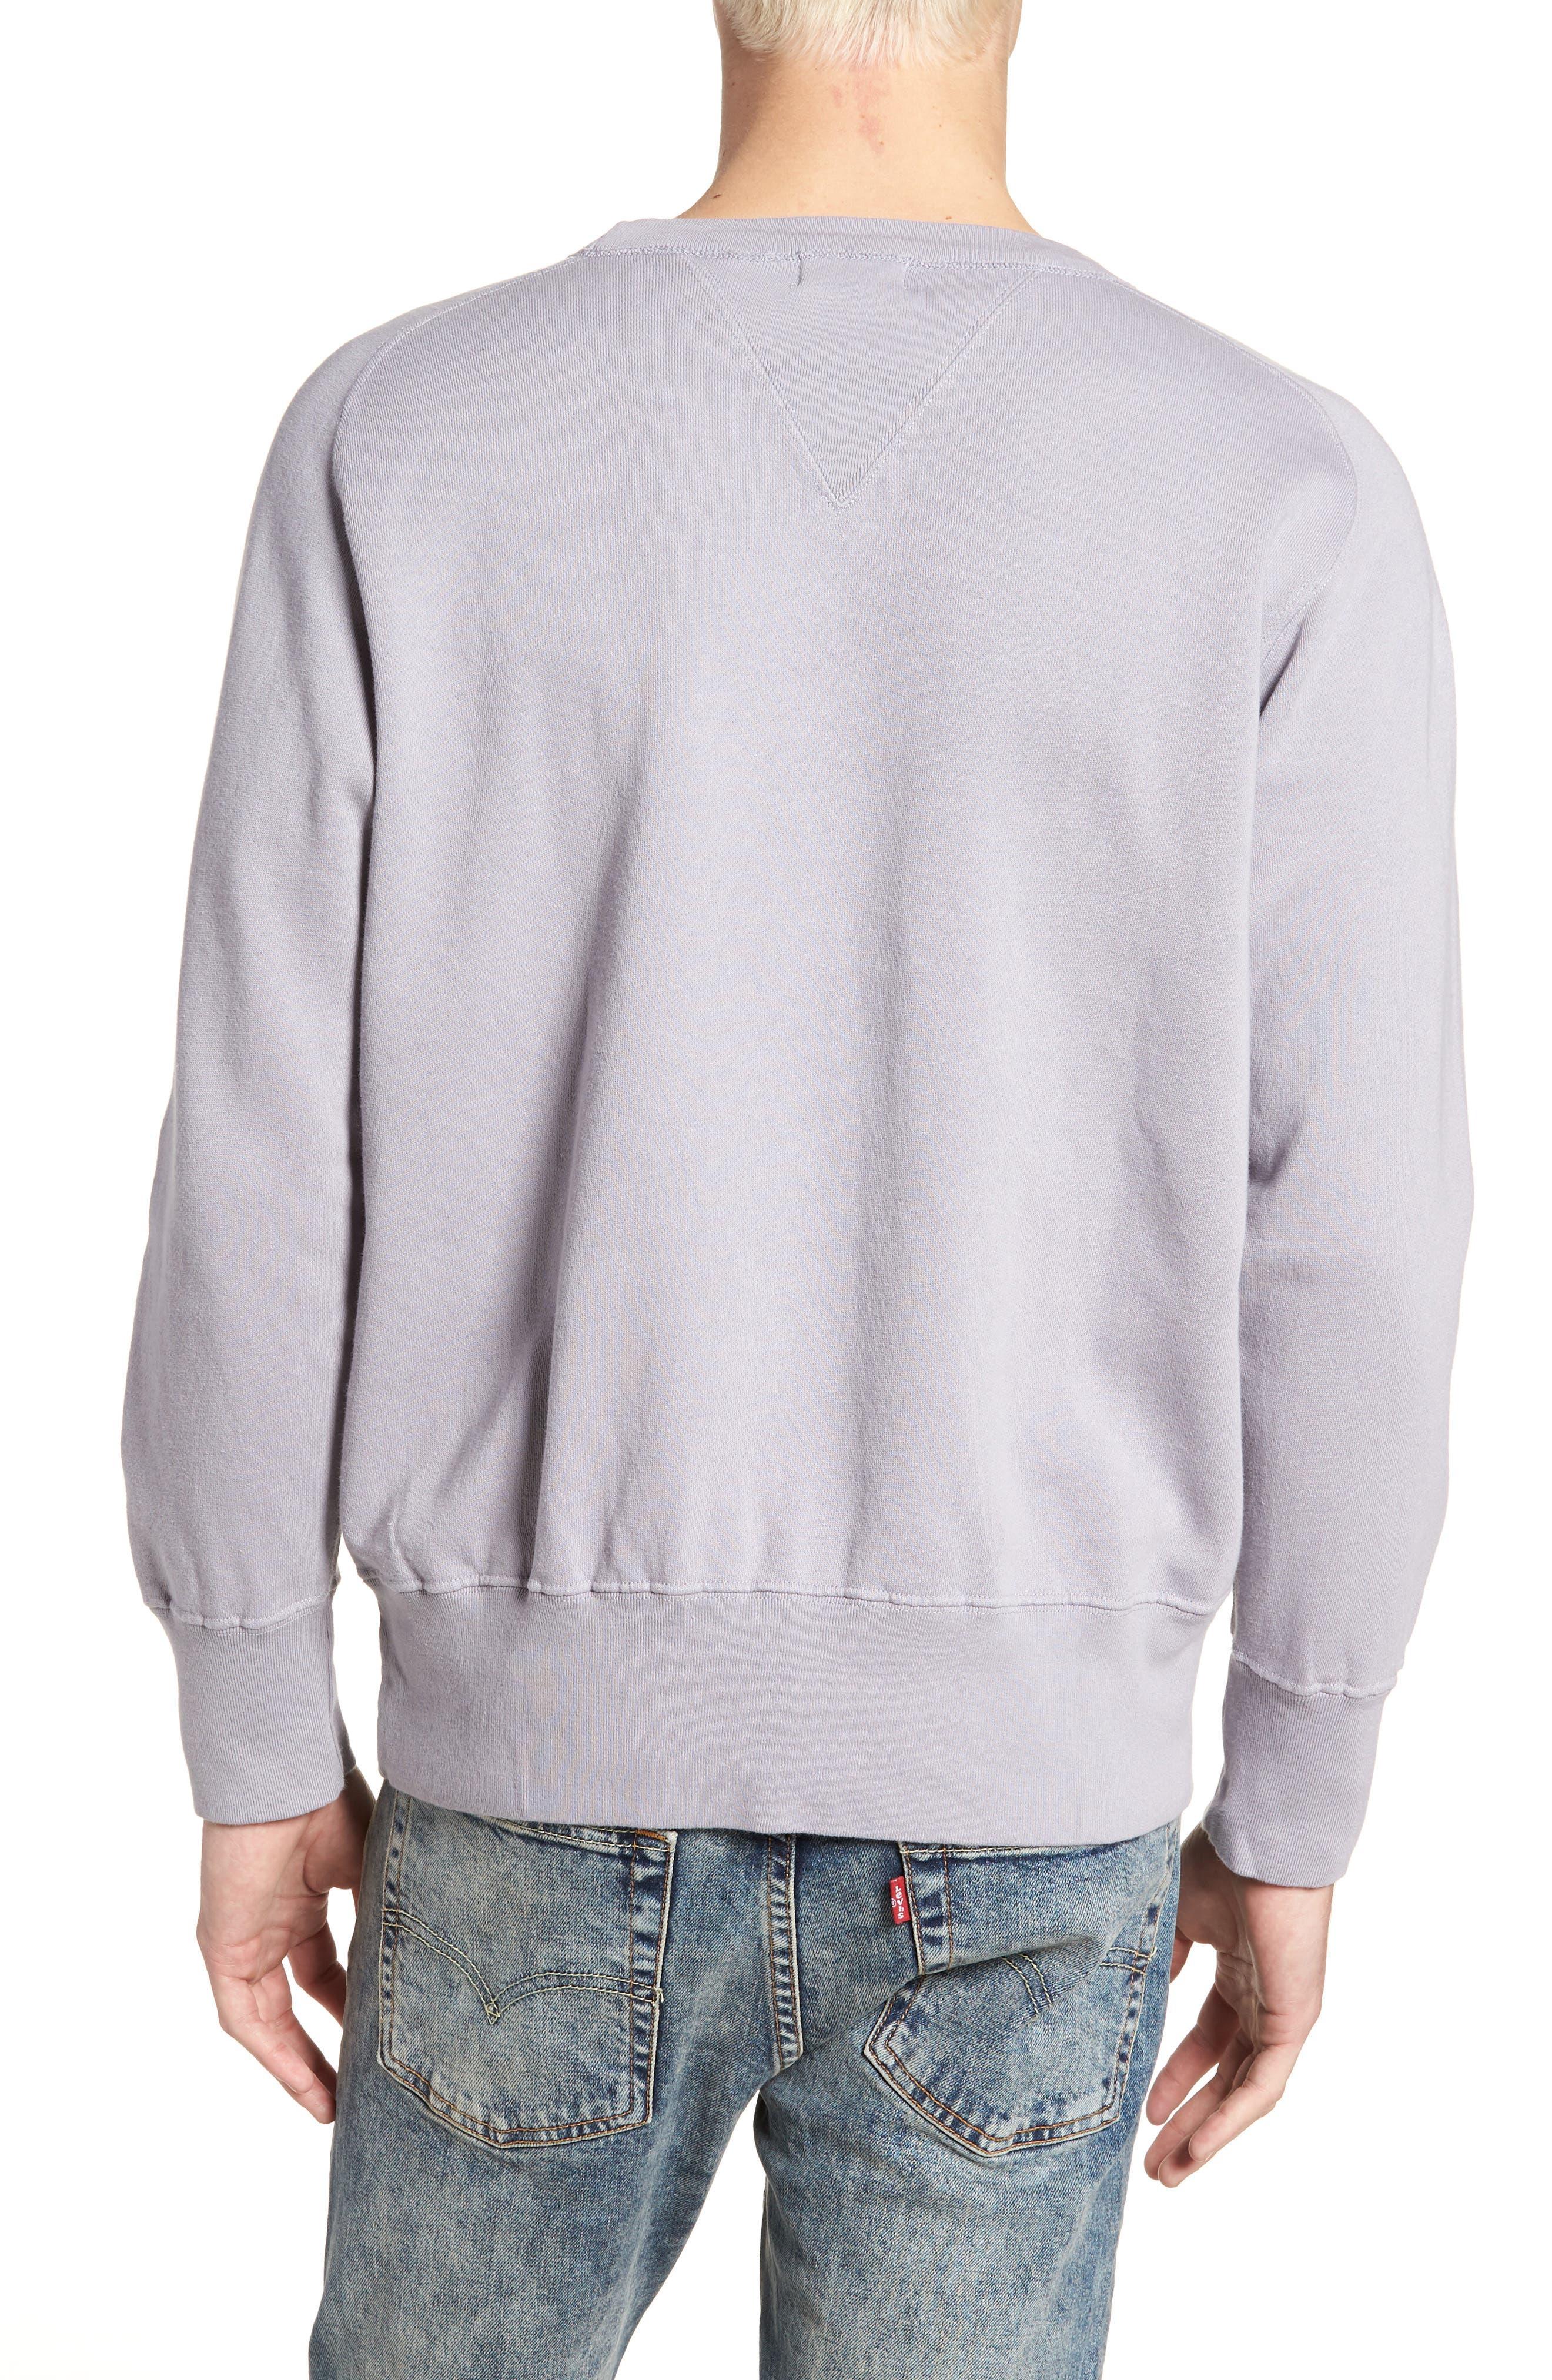 Bay Meadows Sweatshirt,                             Alternate thumbnail 2, color,